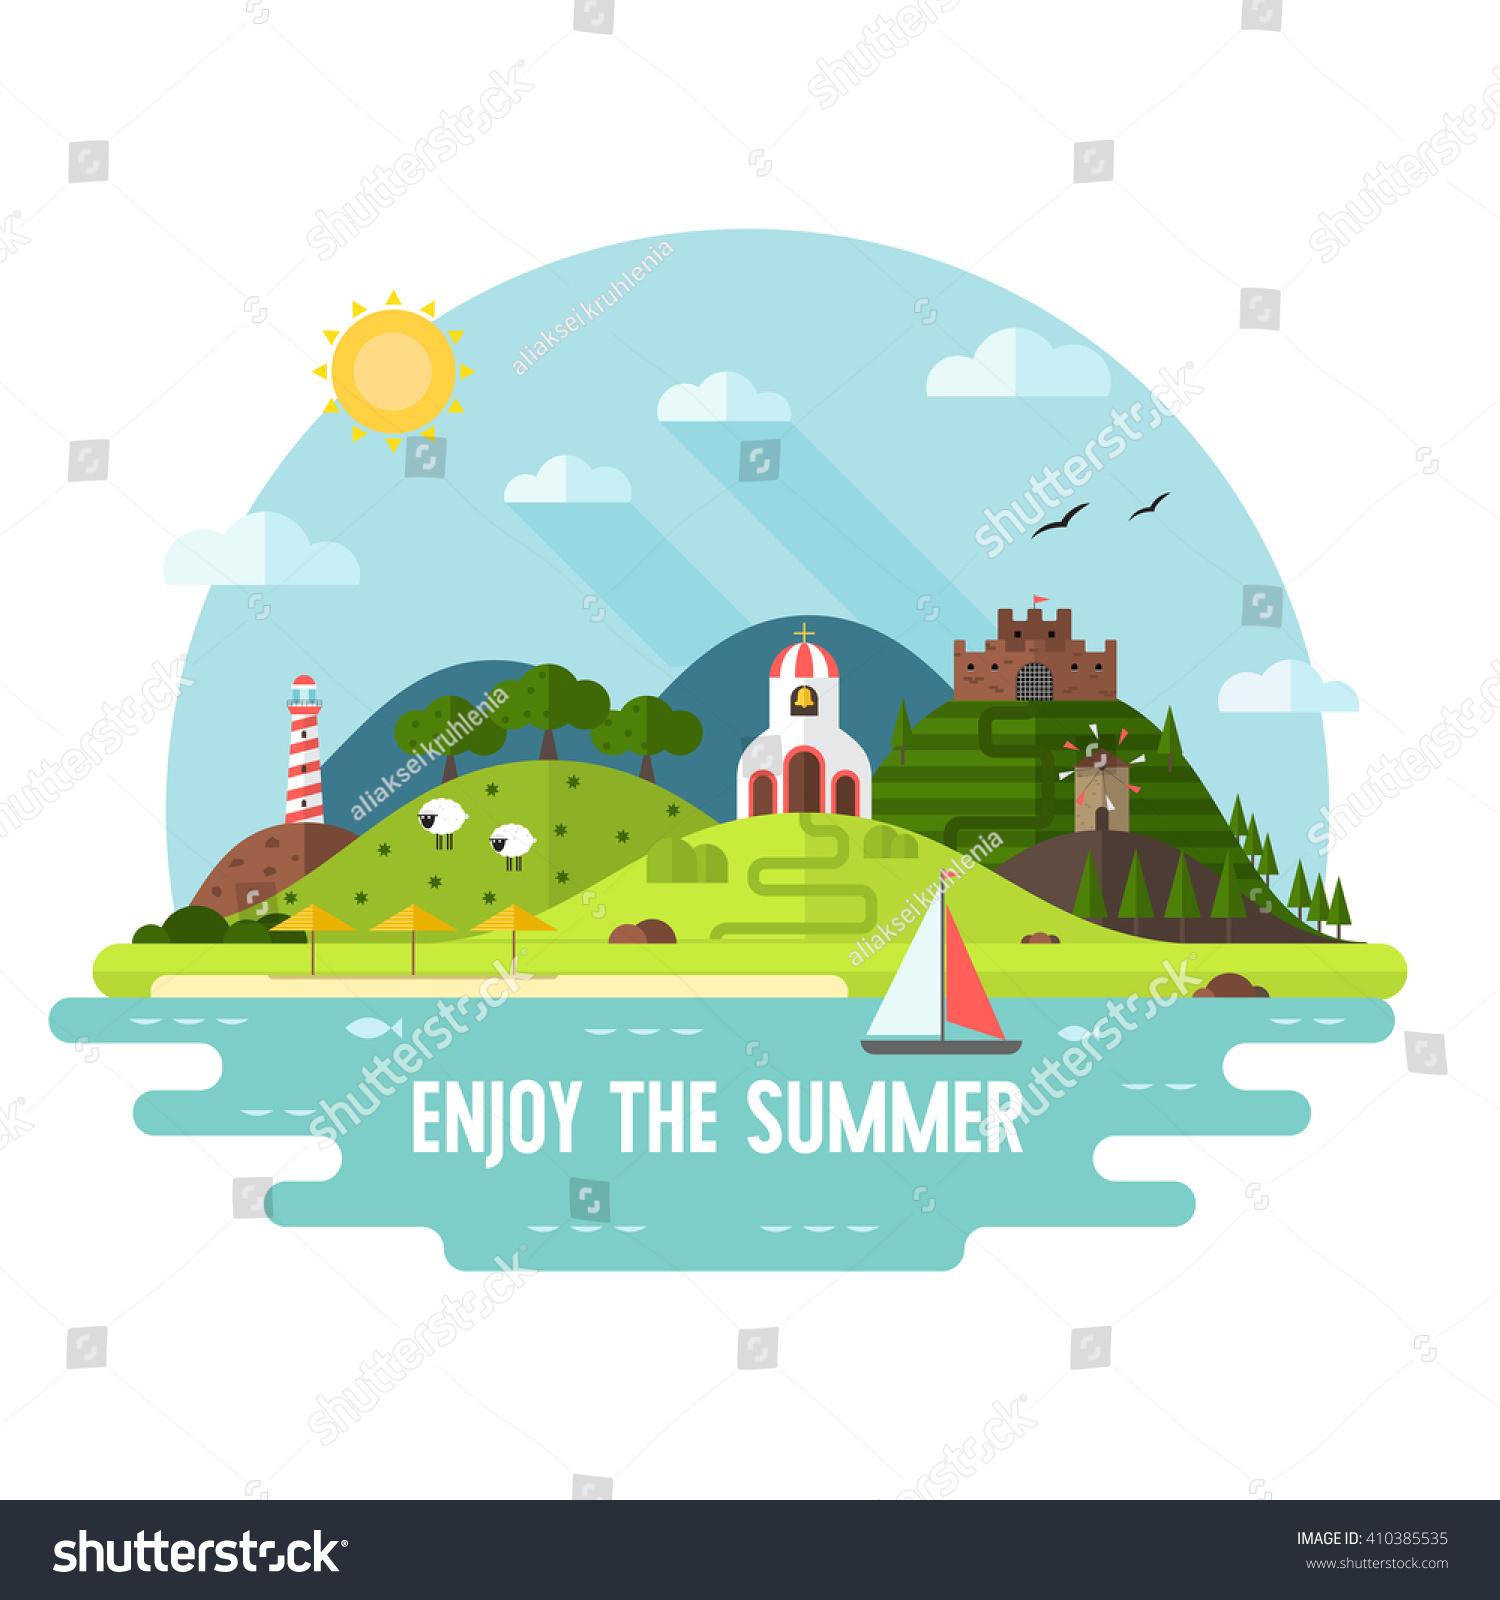 Summer Travel Adventure Flat Landscape Sea Stock Vector ...